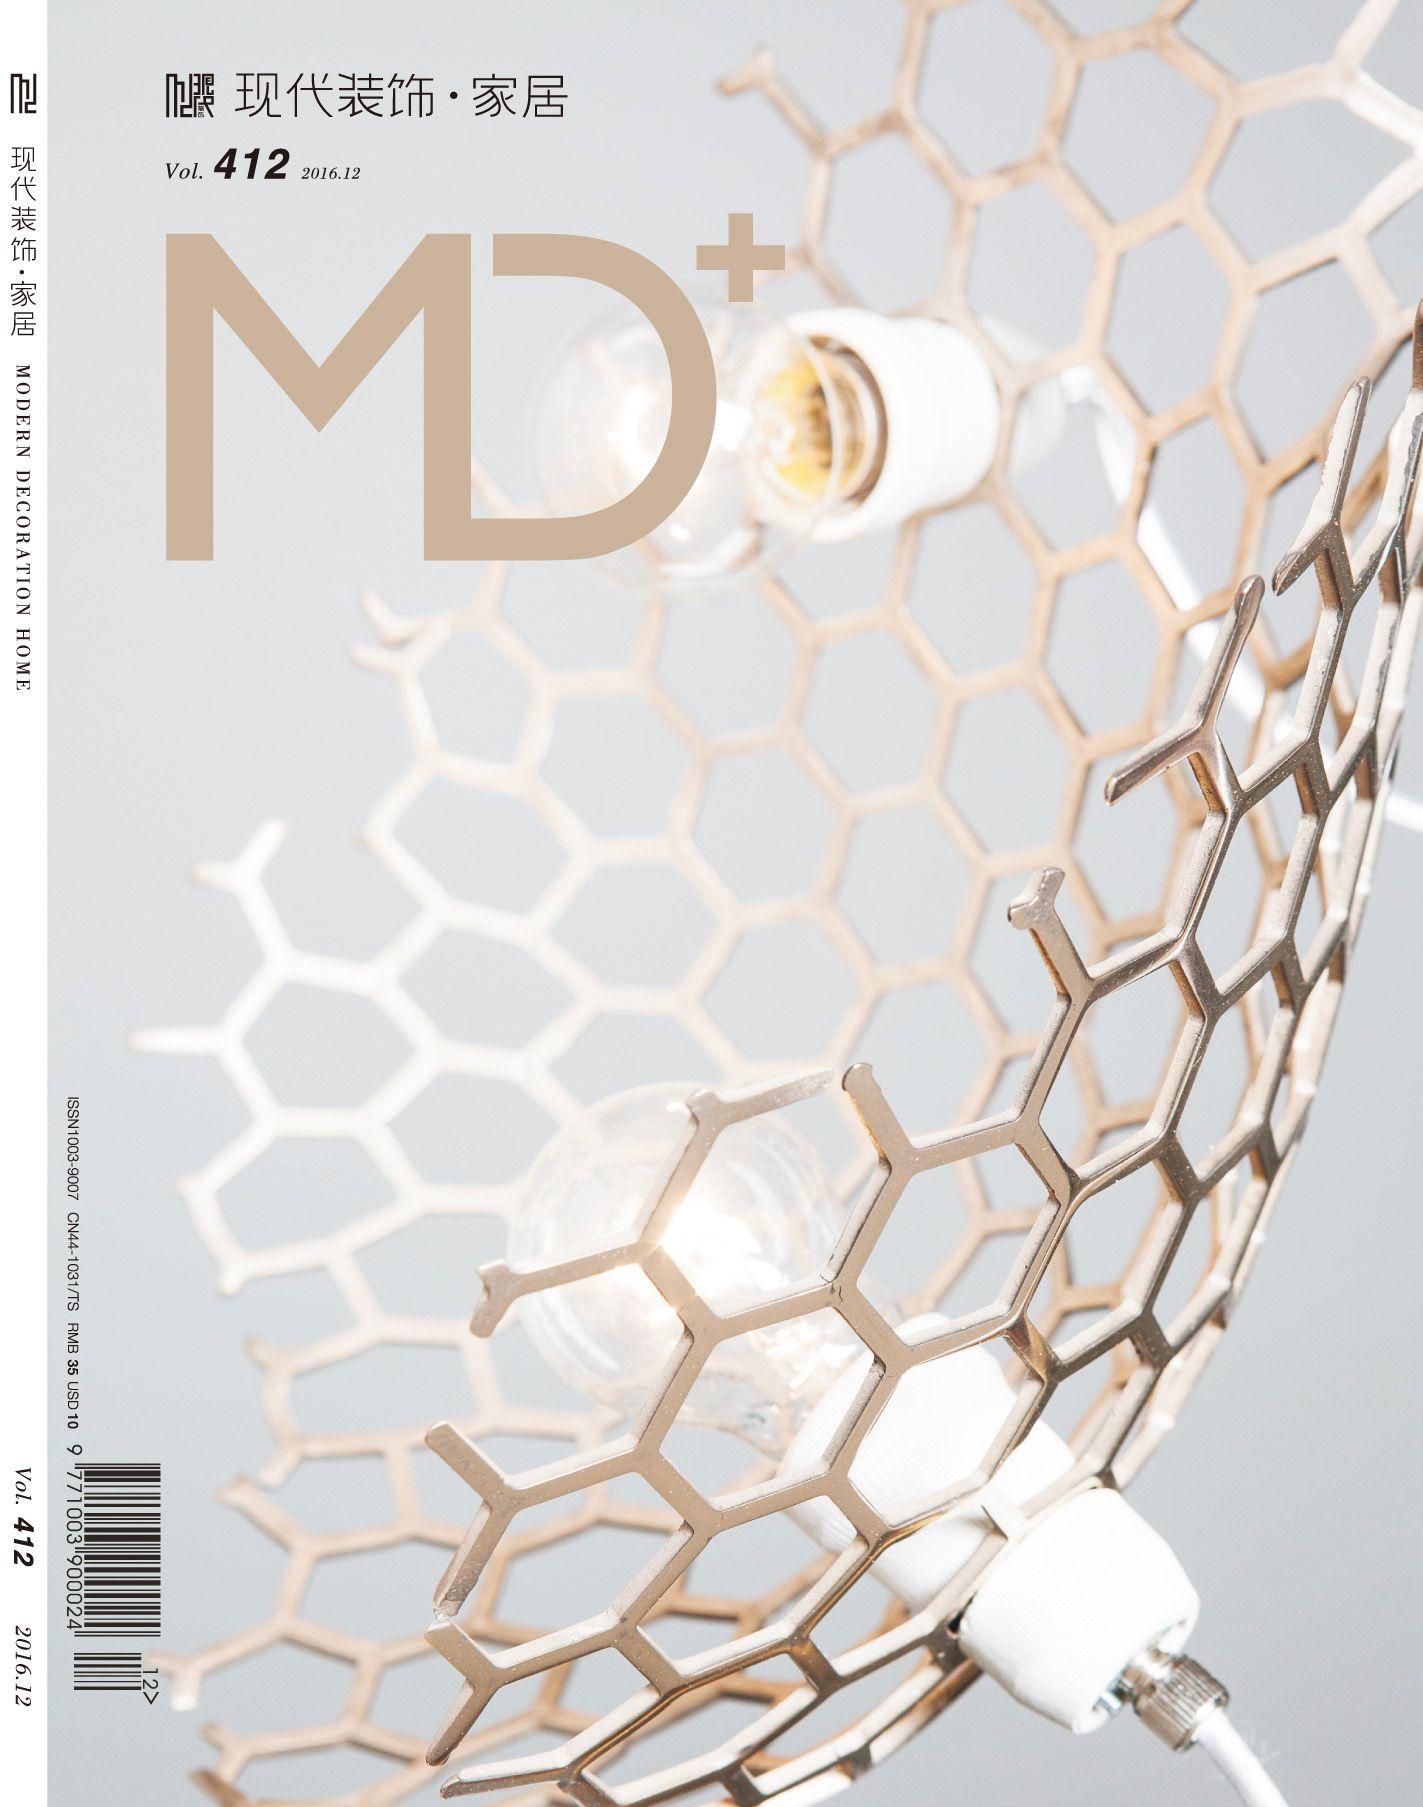 412 Dec. Front Cover